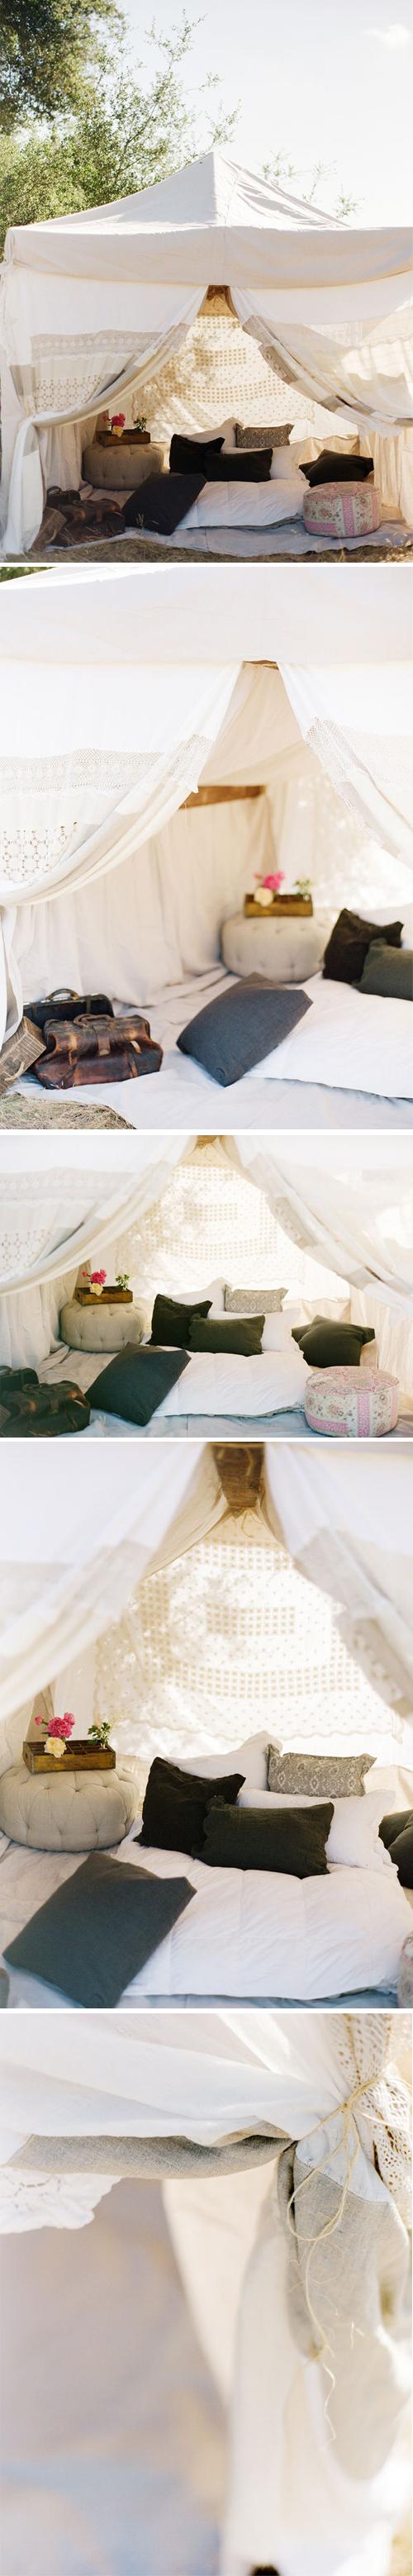 Vitnage-Tent